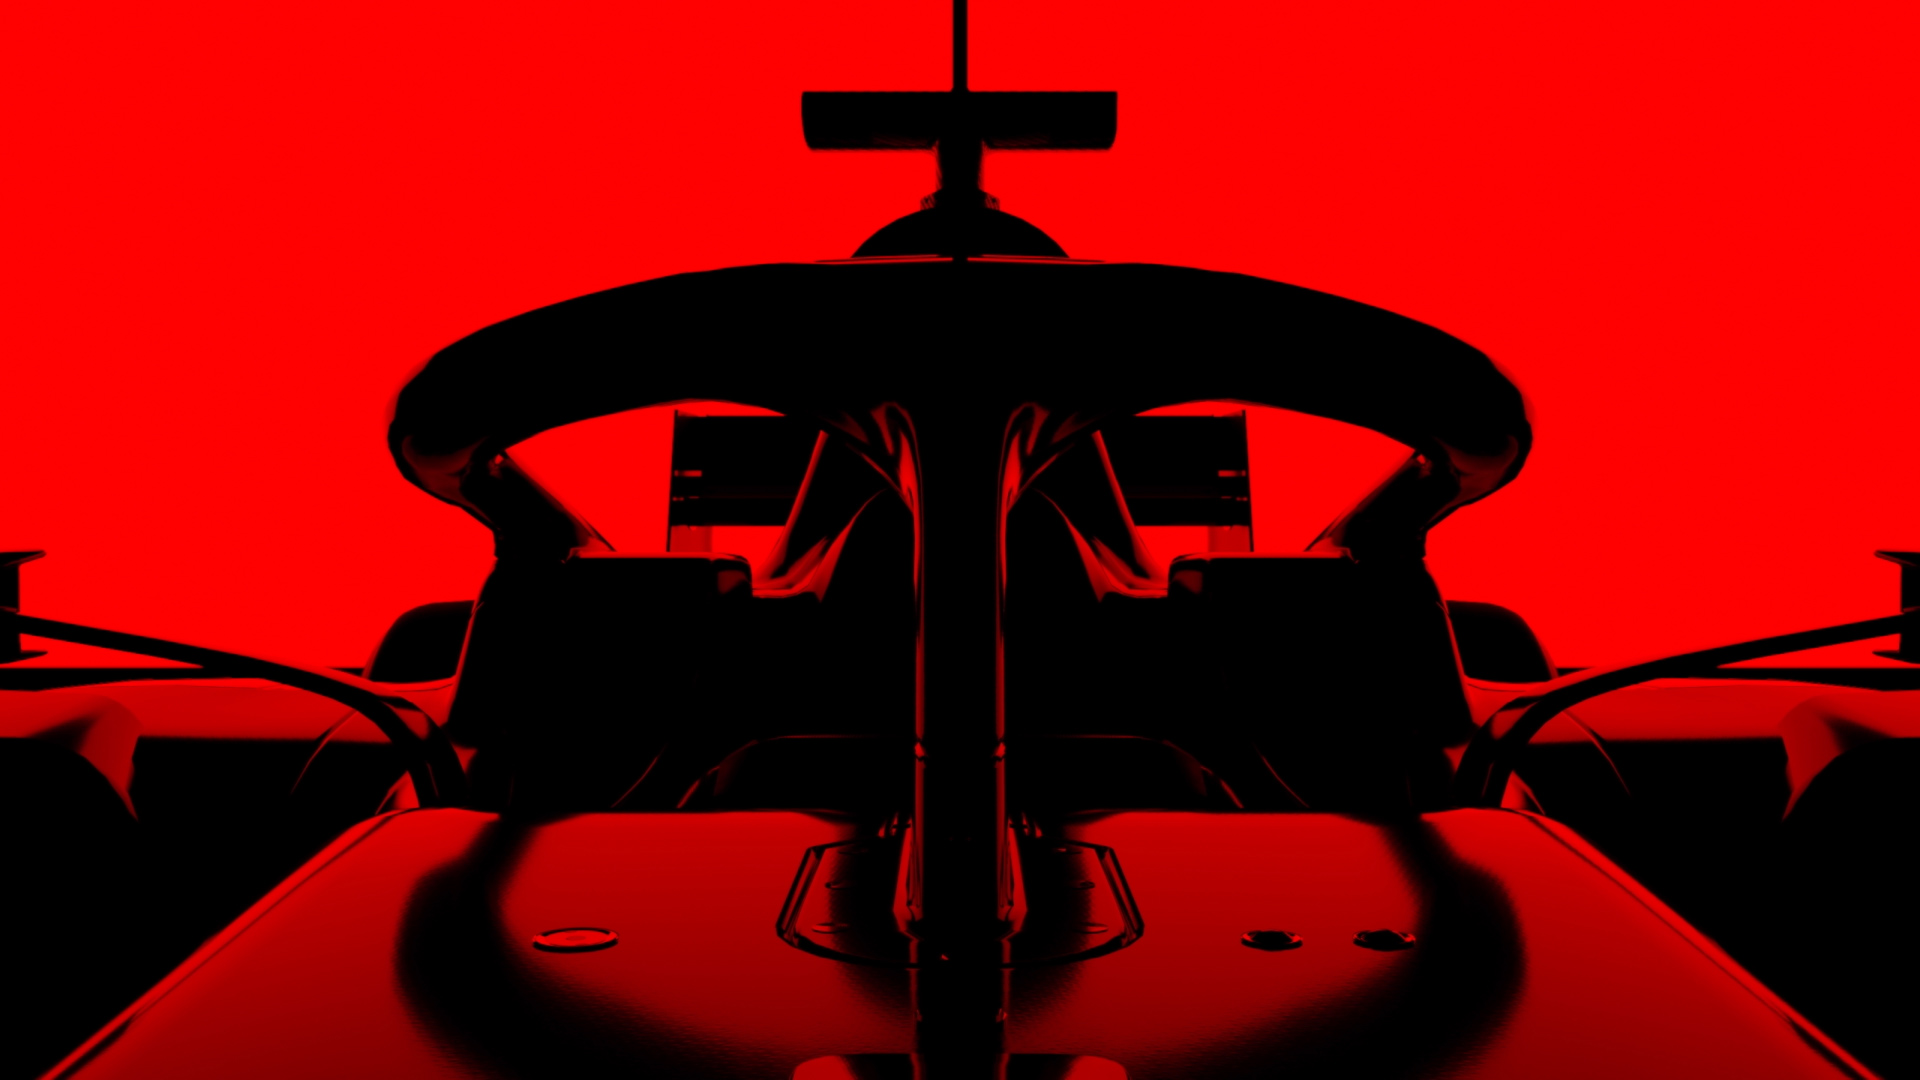 Codemasters annonce la date de sortie de F1 2019